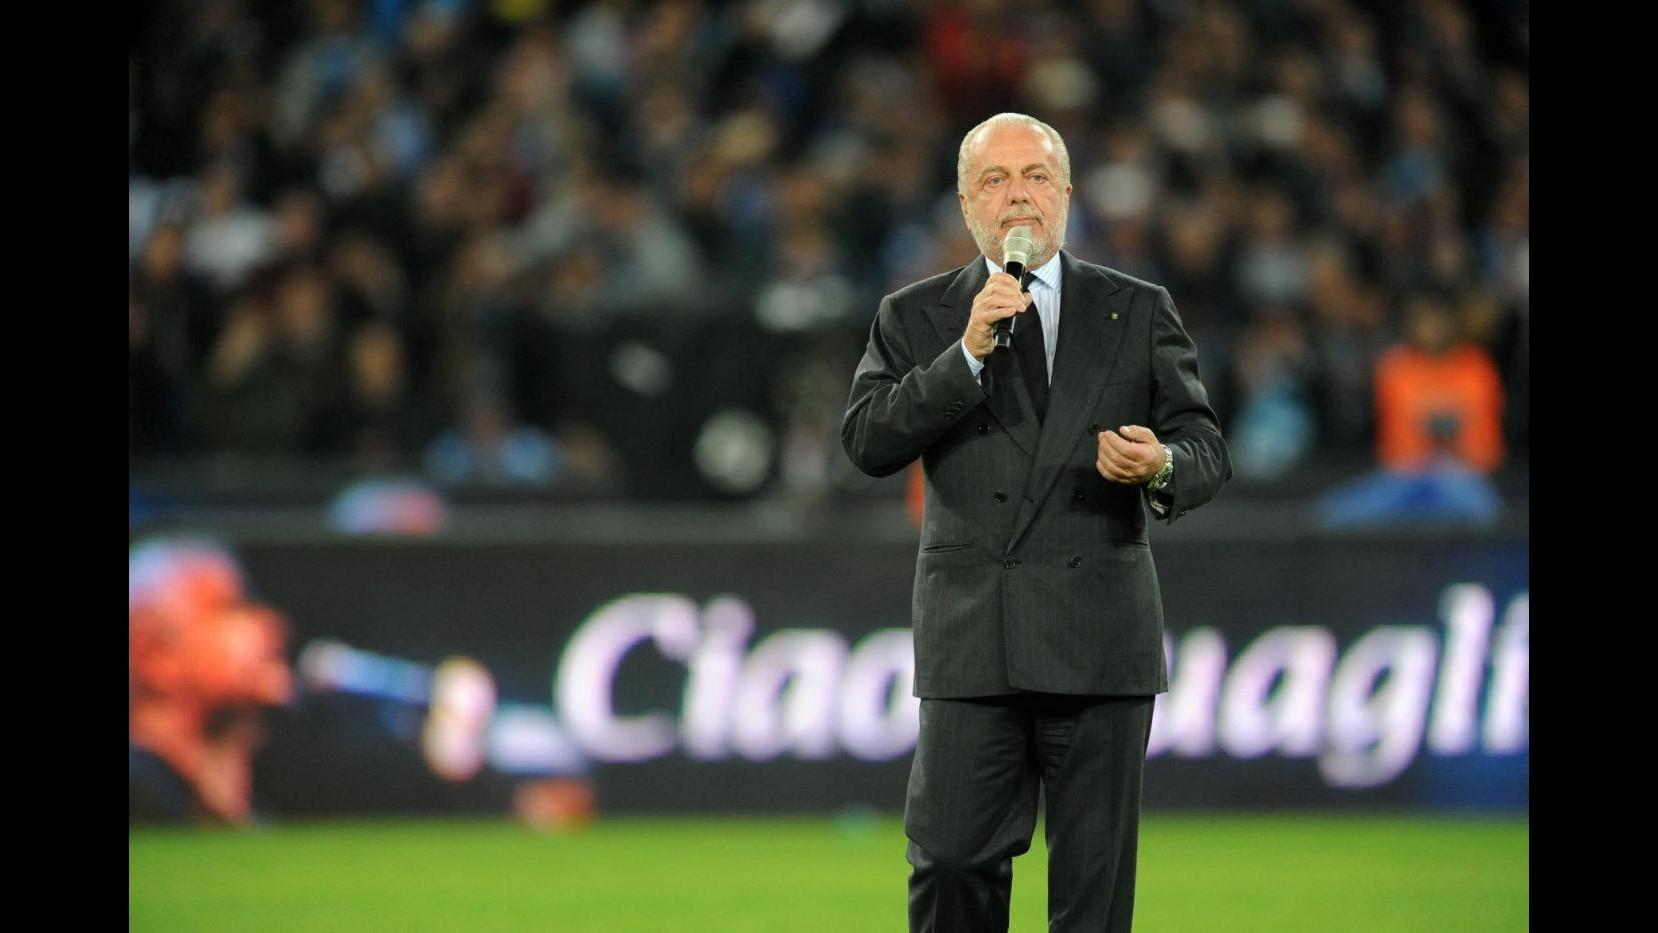 Napoli, De Laurentiis: Contesto accuse Nicchi, miei tweet non offensivi